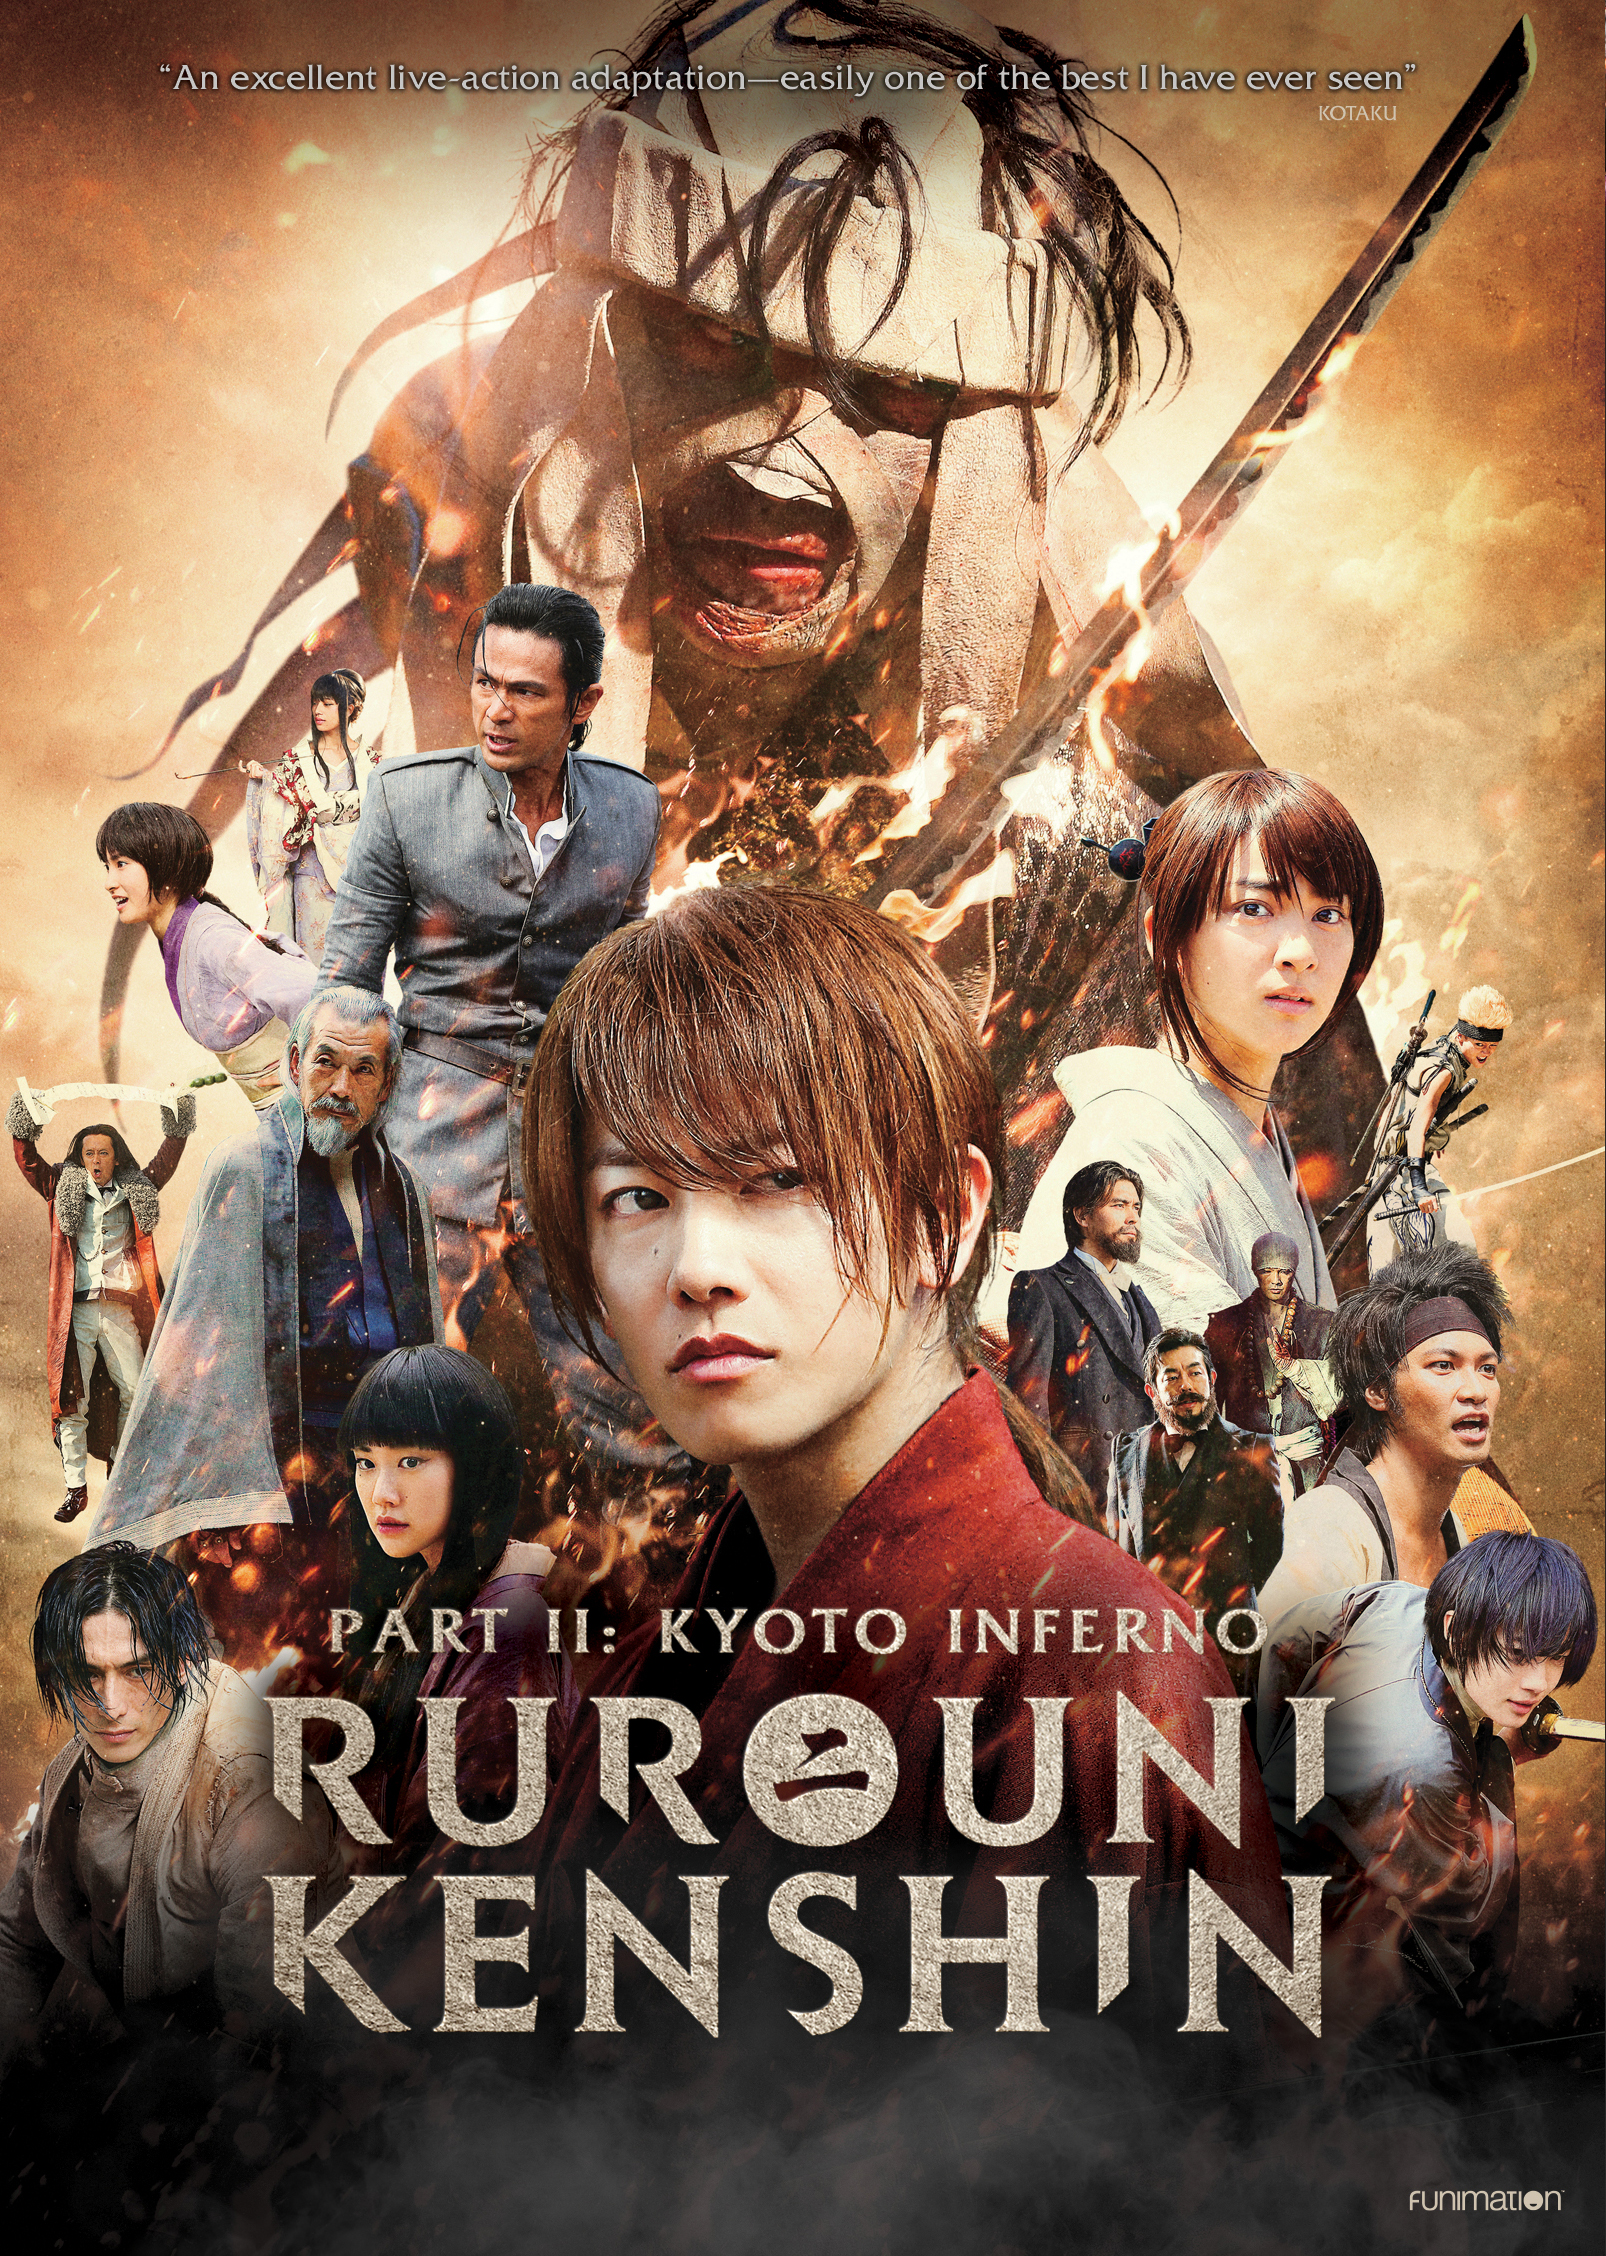 Rurouni kenshin the legend ends full movie 2014 - 1 2